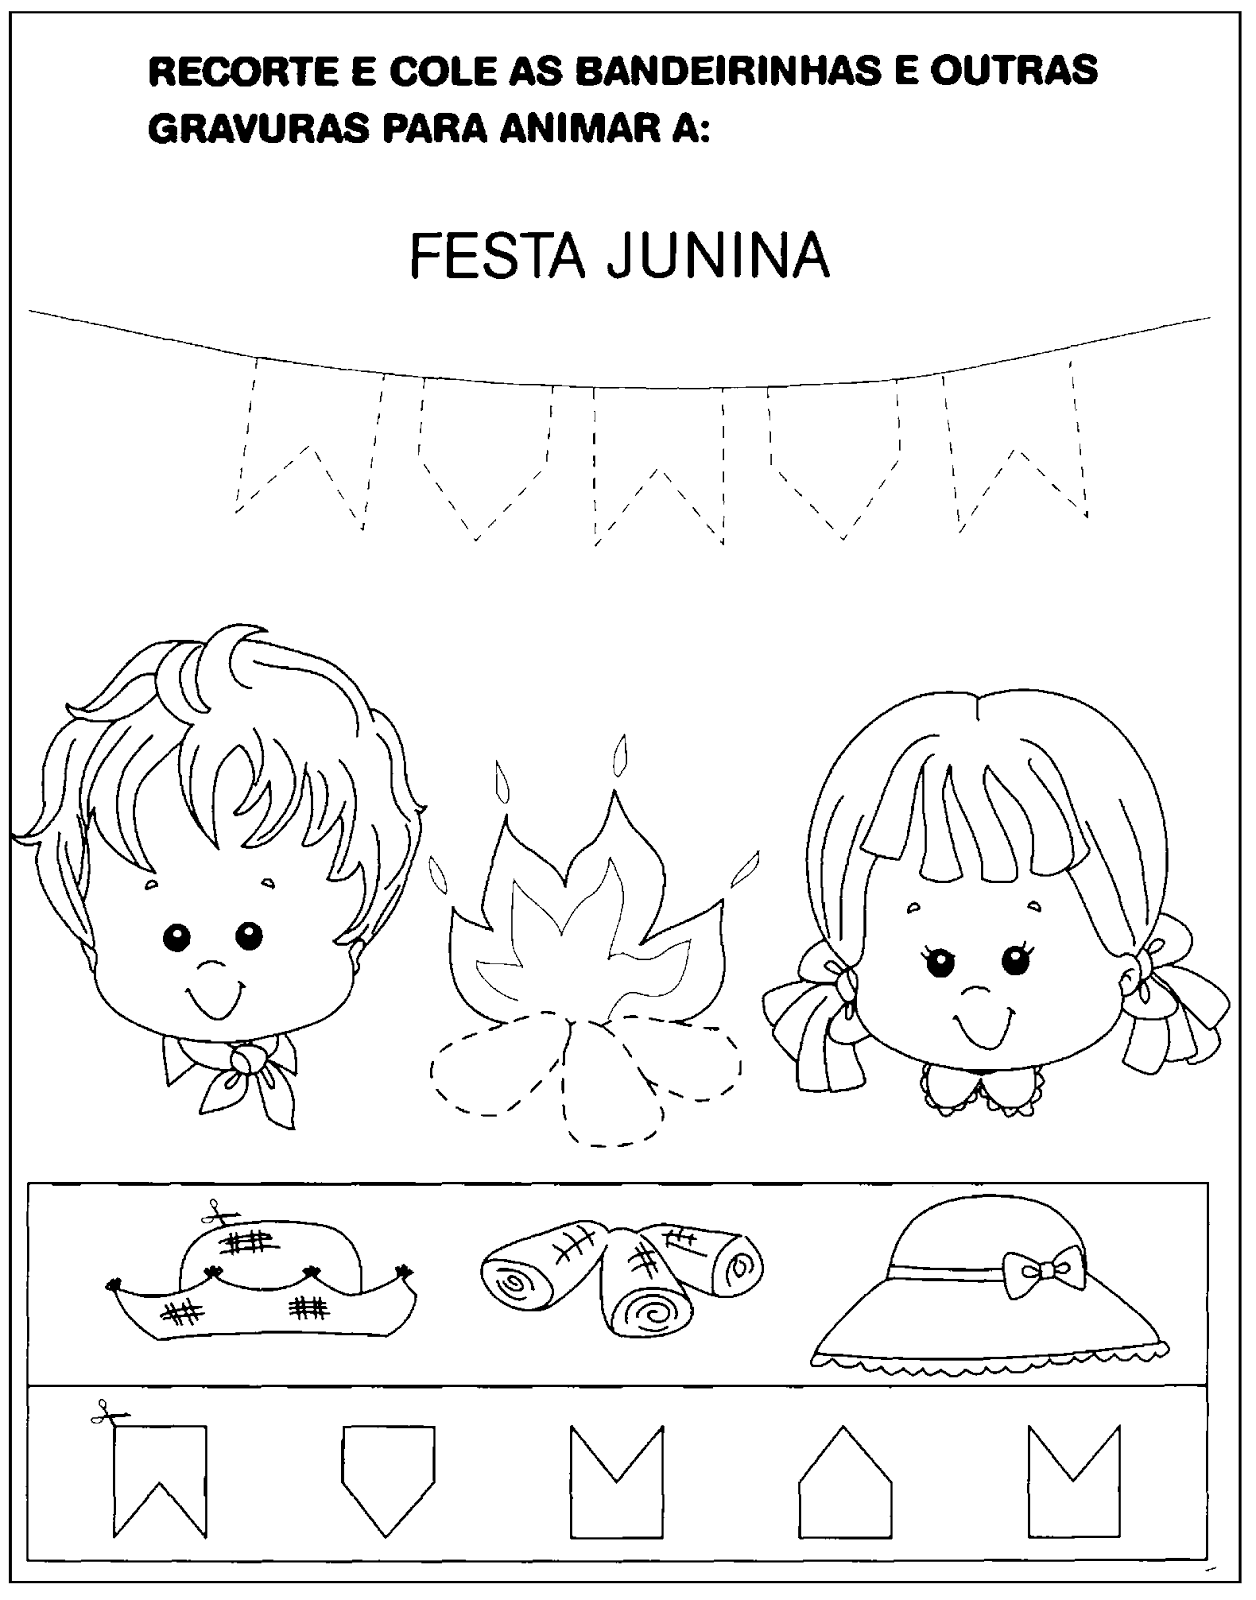 Atividades Sobre Festa Junina Para Educacao Infantil So Escola